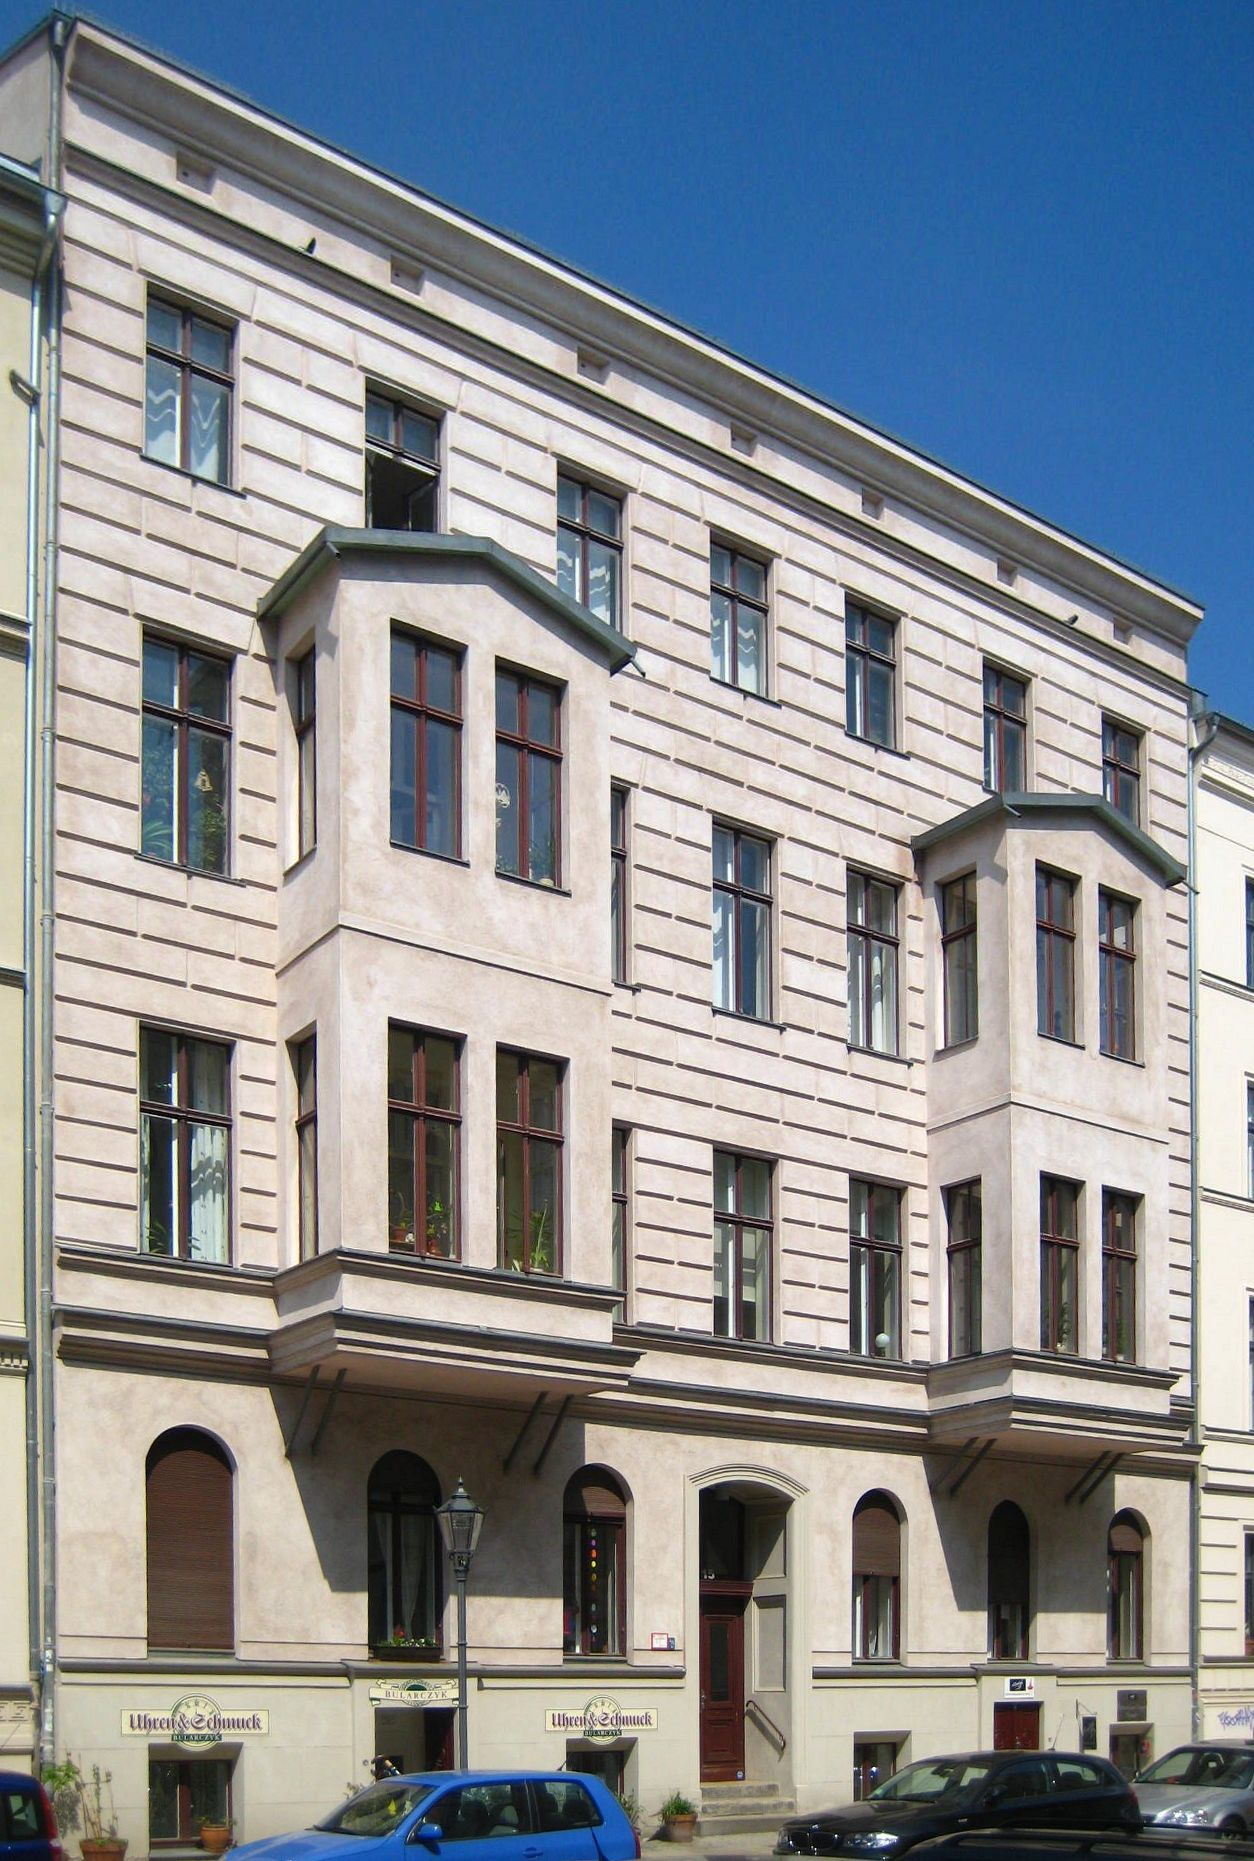 Fileberlin mitte krausnickstrasse 15 mietshaus jpg wikimedia